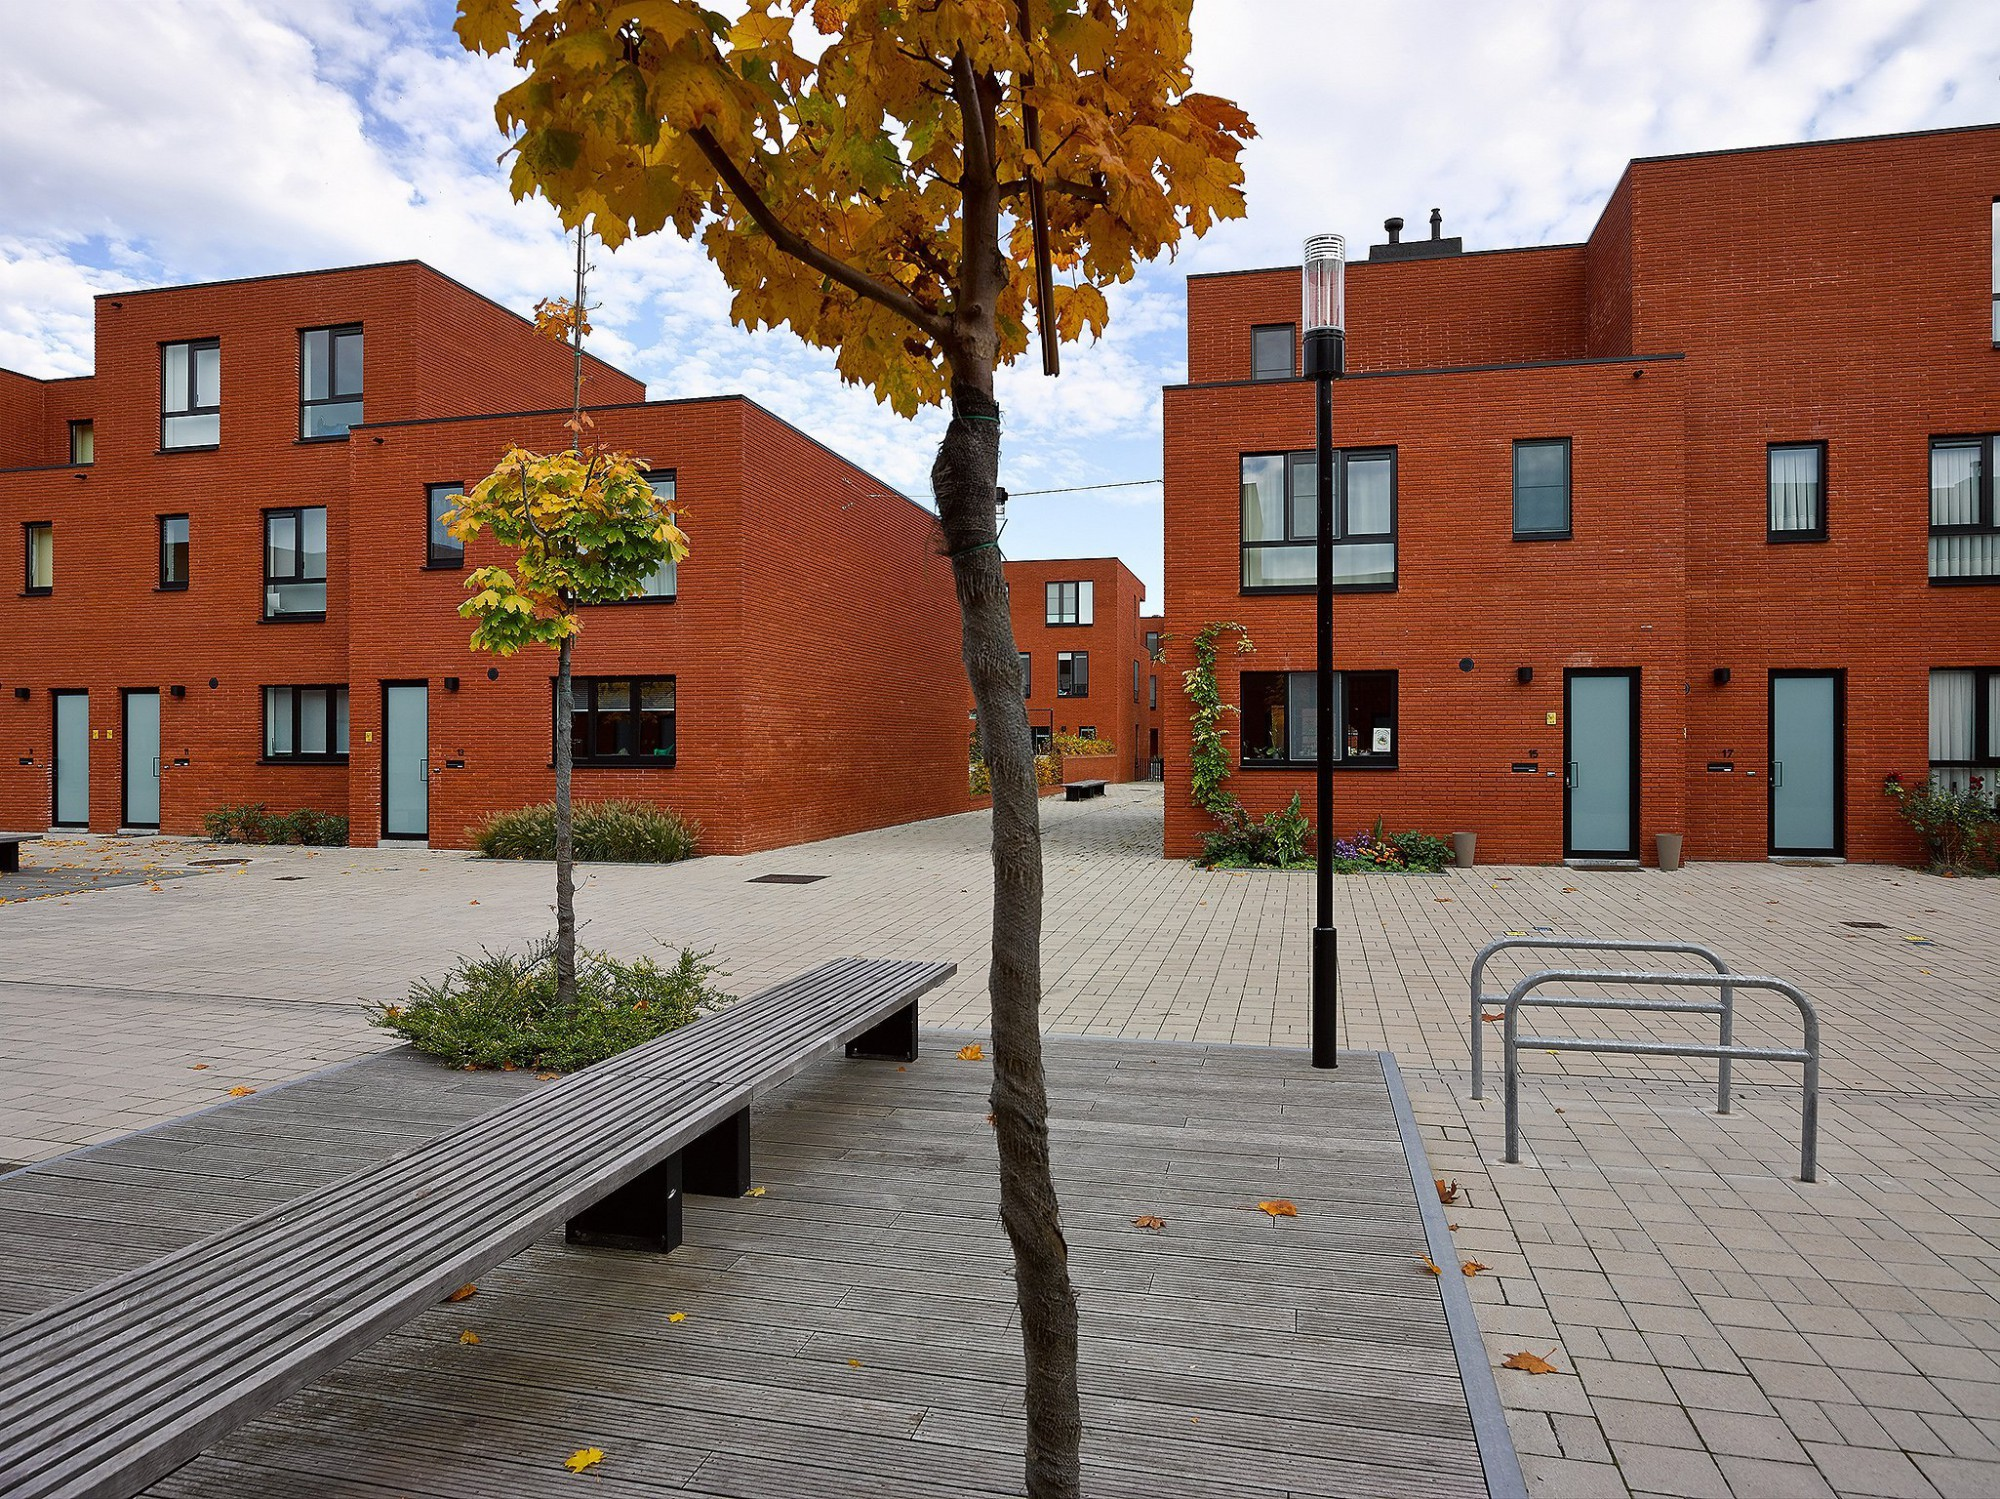 Afbeelding: Architectuur fotografie, sociale woningen, centrale werkplaatsen Te Kessel-Lo, voor groep van Roey.